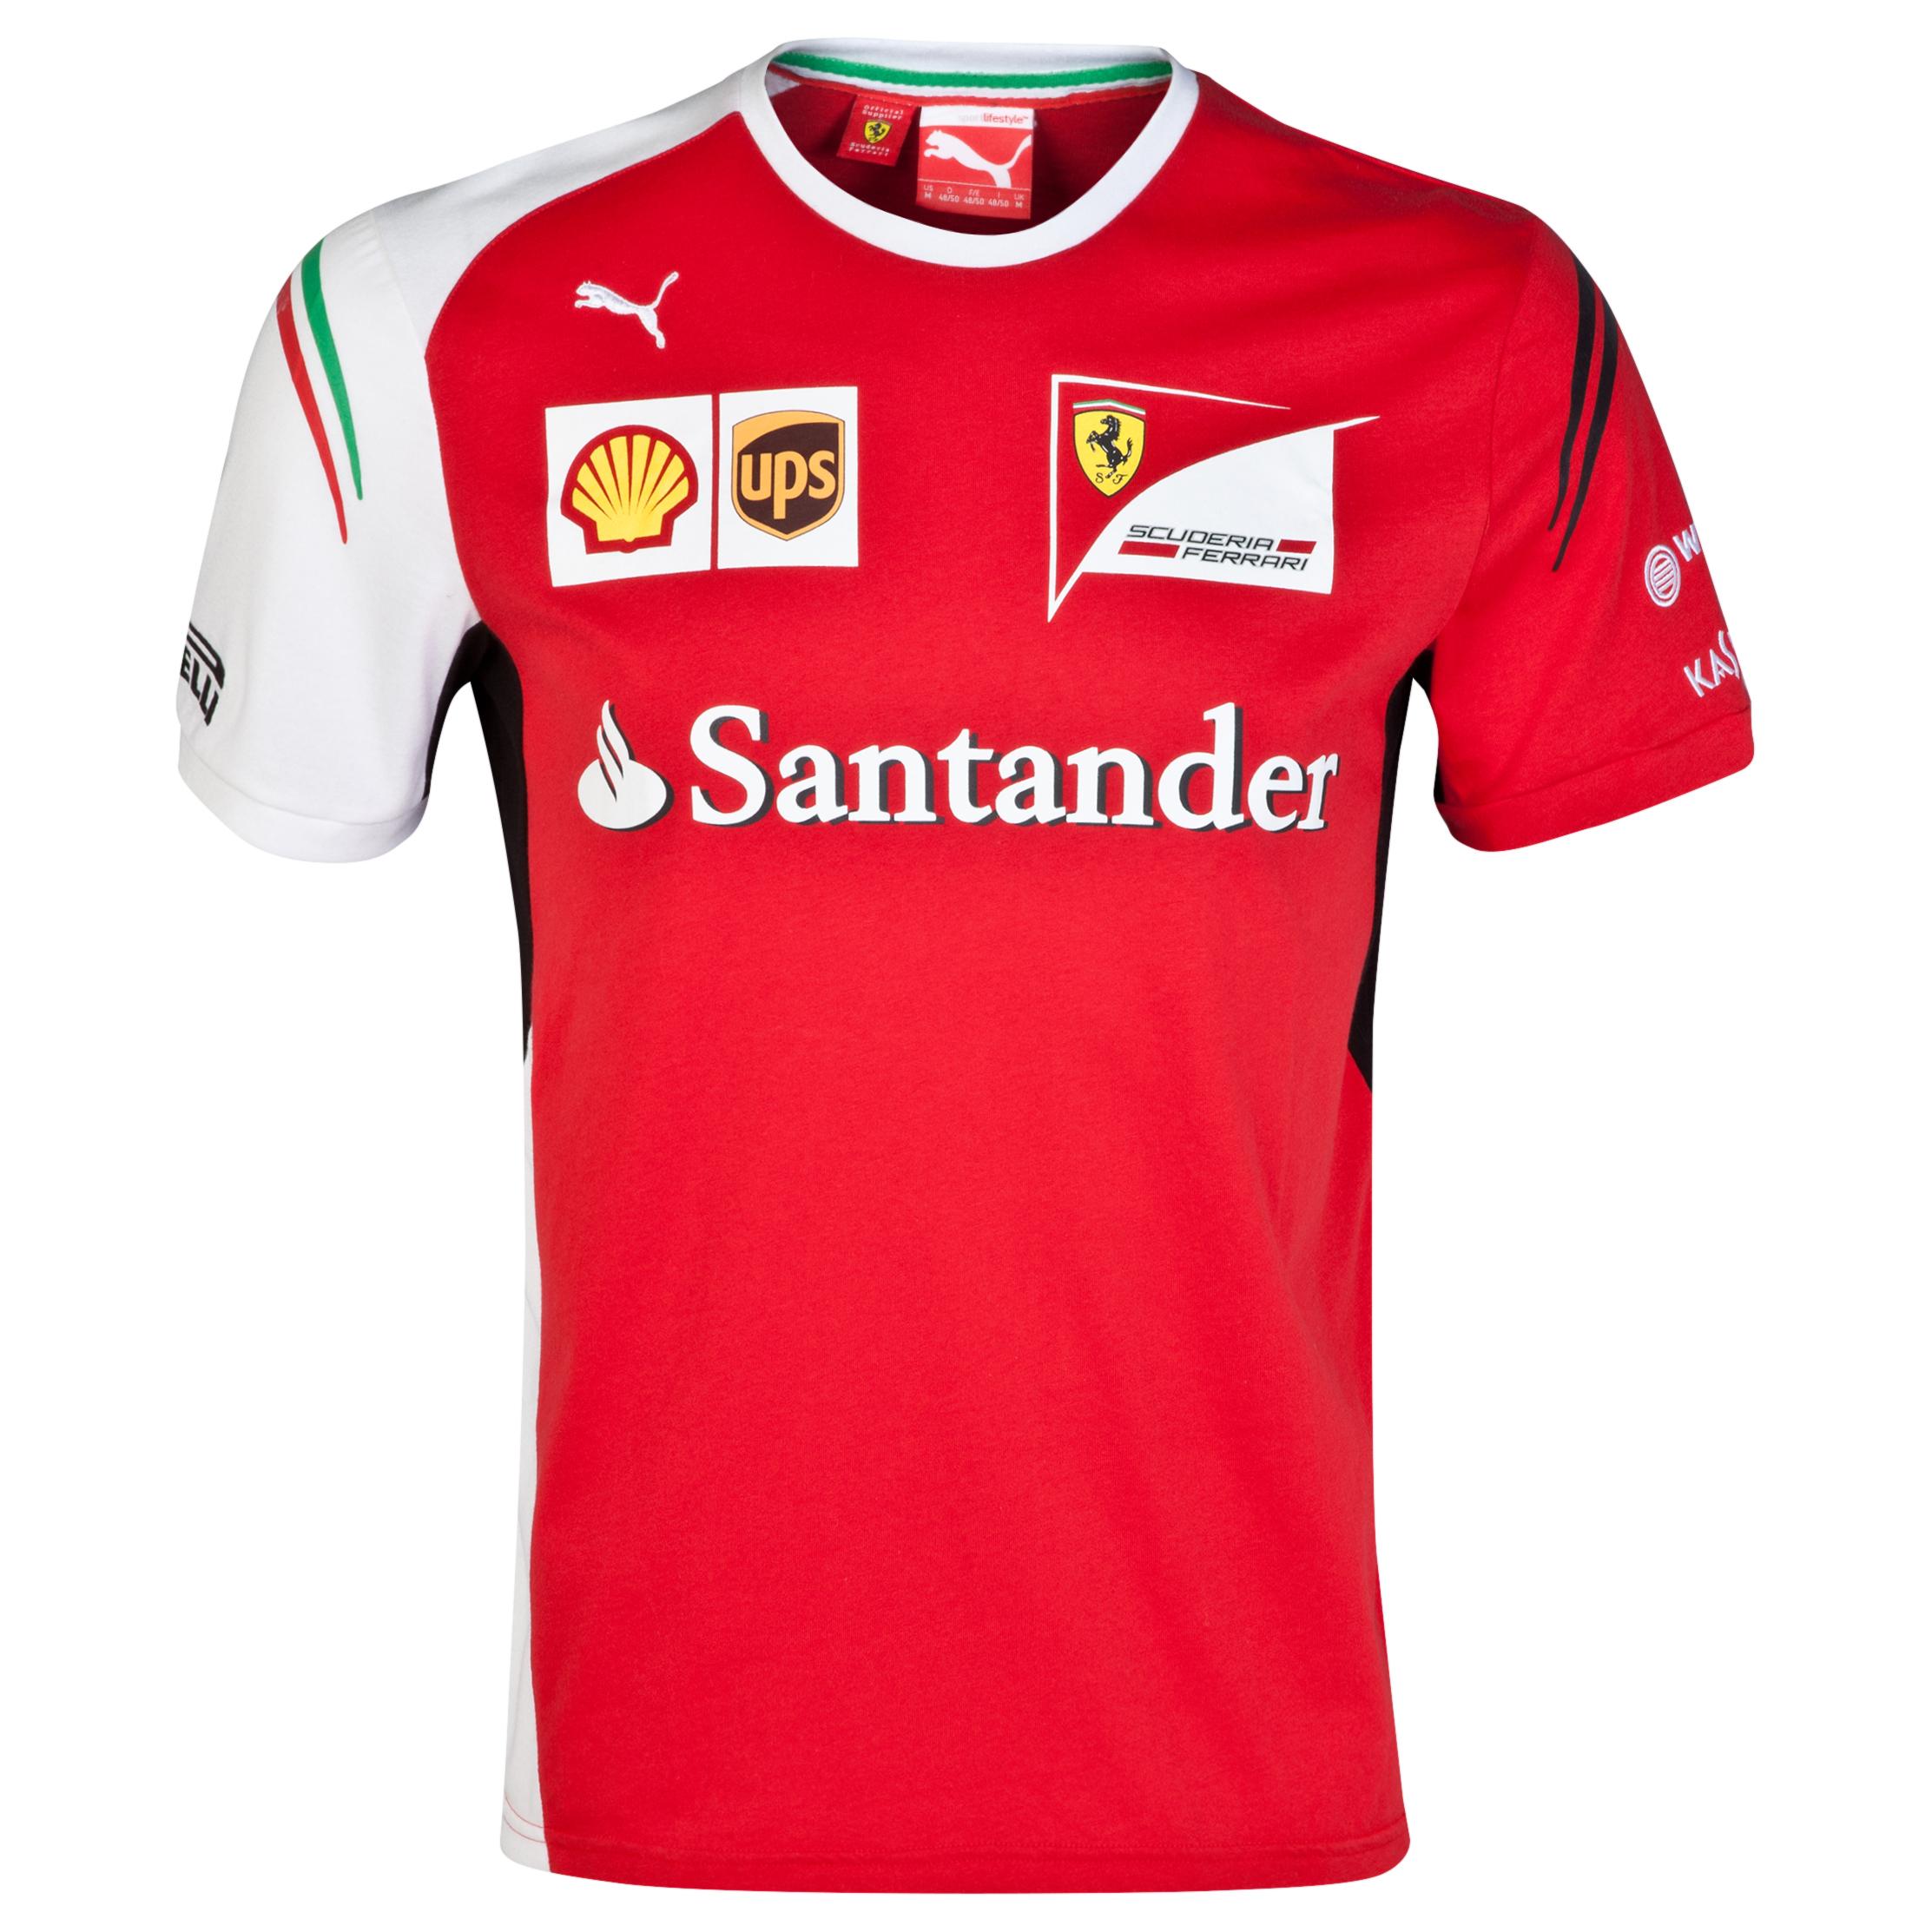 Scuderia Ferrari Team T-Shirt Red